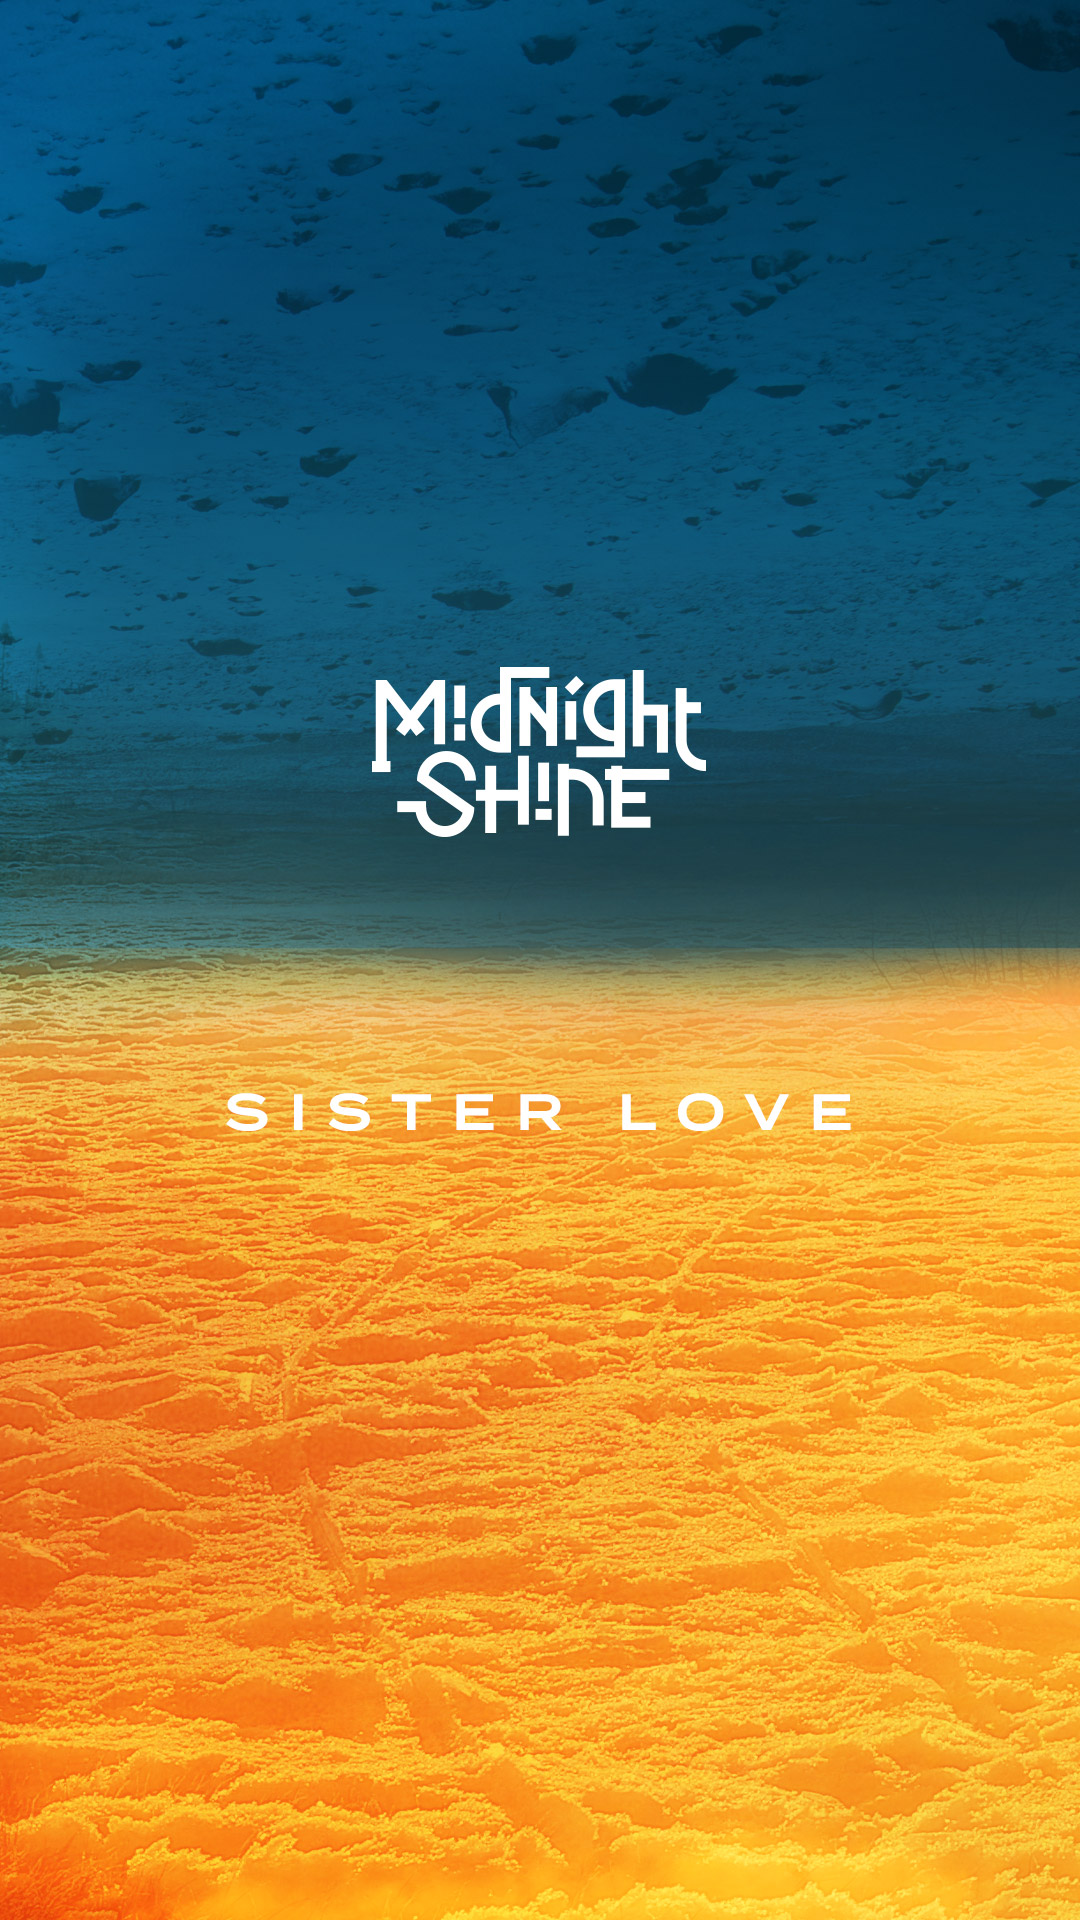 sisterlove-phone